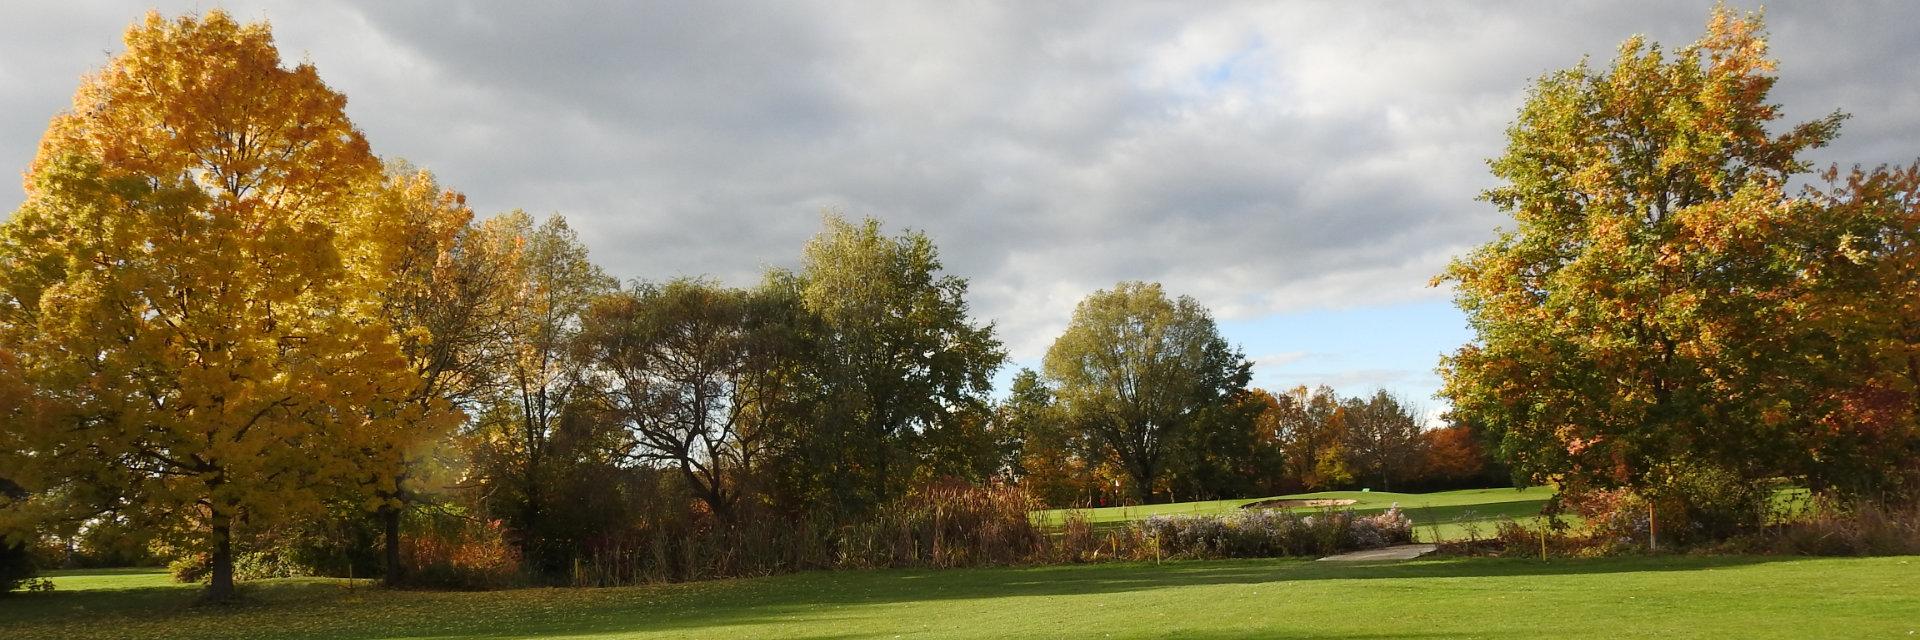 Golfplatz_Herbst_2020_10_24_54_slider